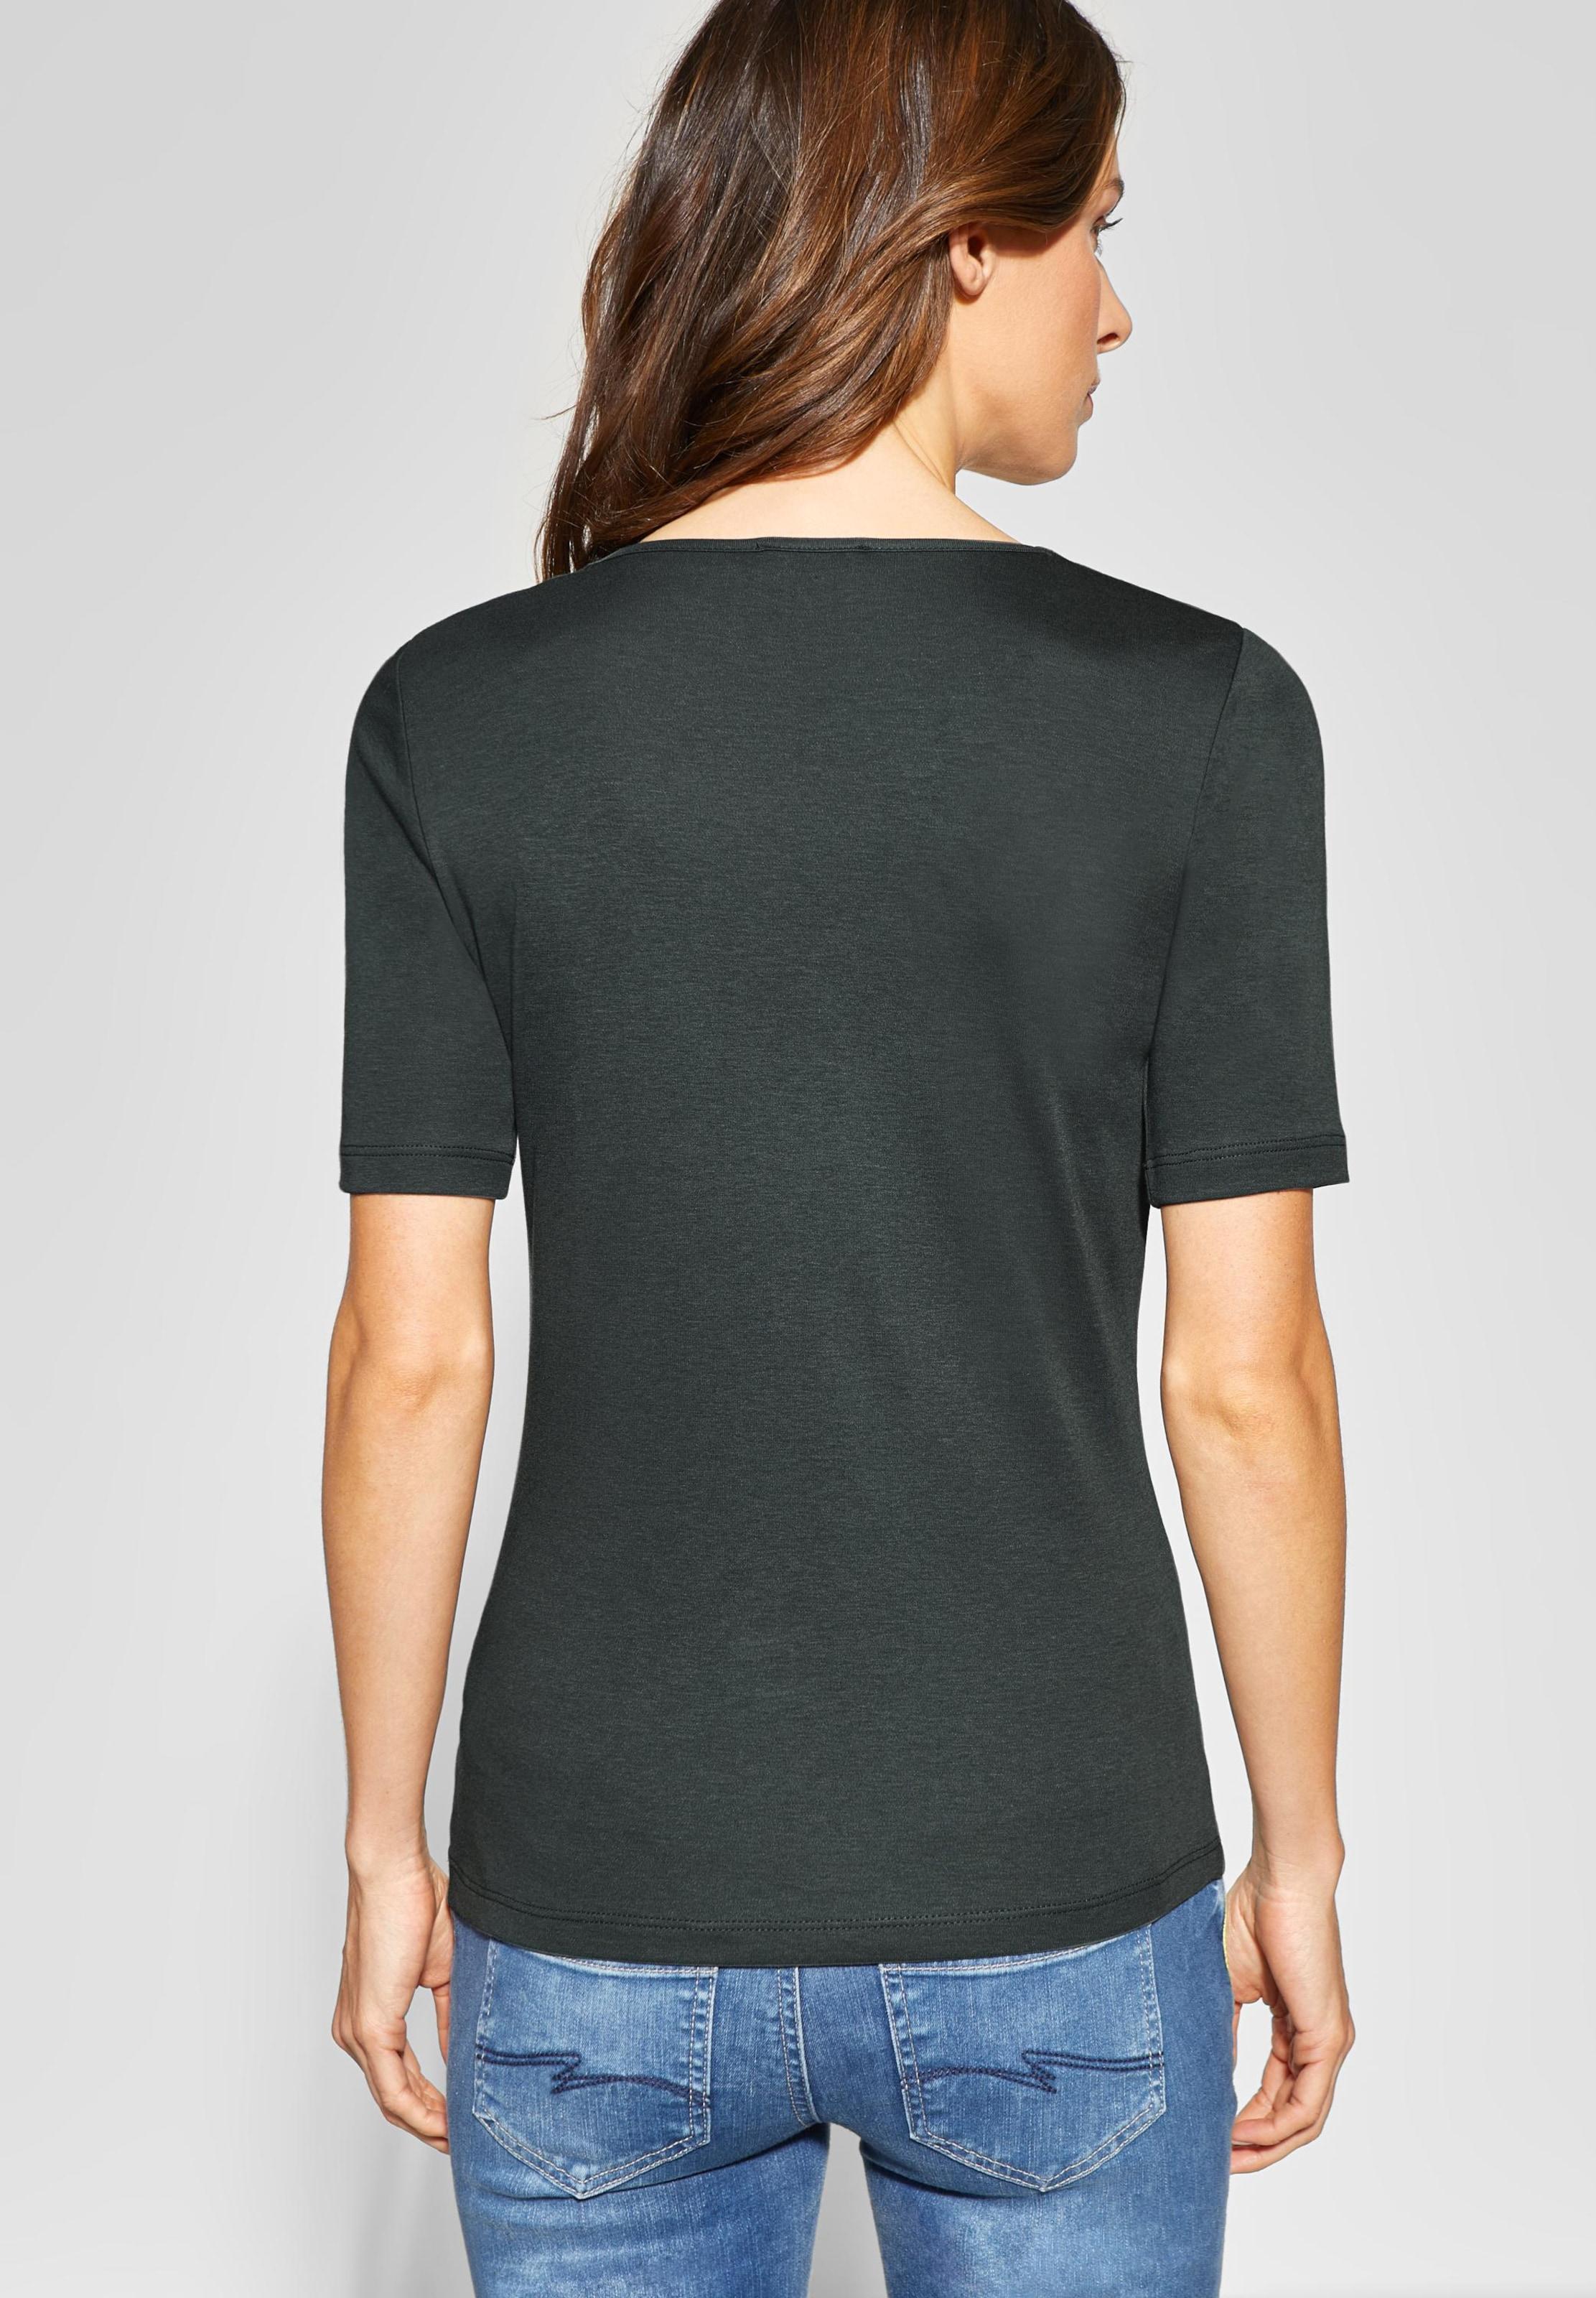 One Street Shirt Dunkelgrün 'palmira' In fY6yvgb7